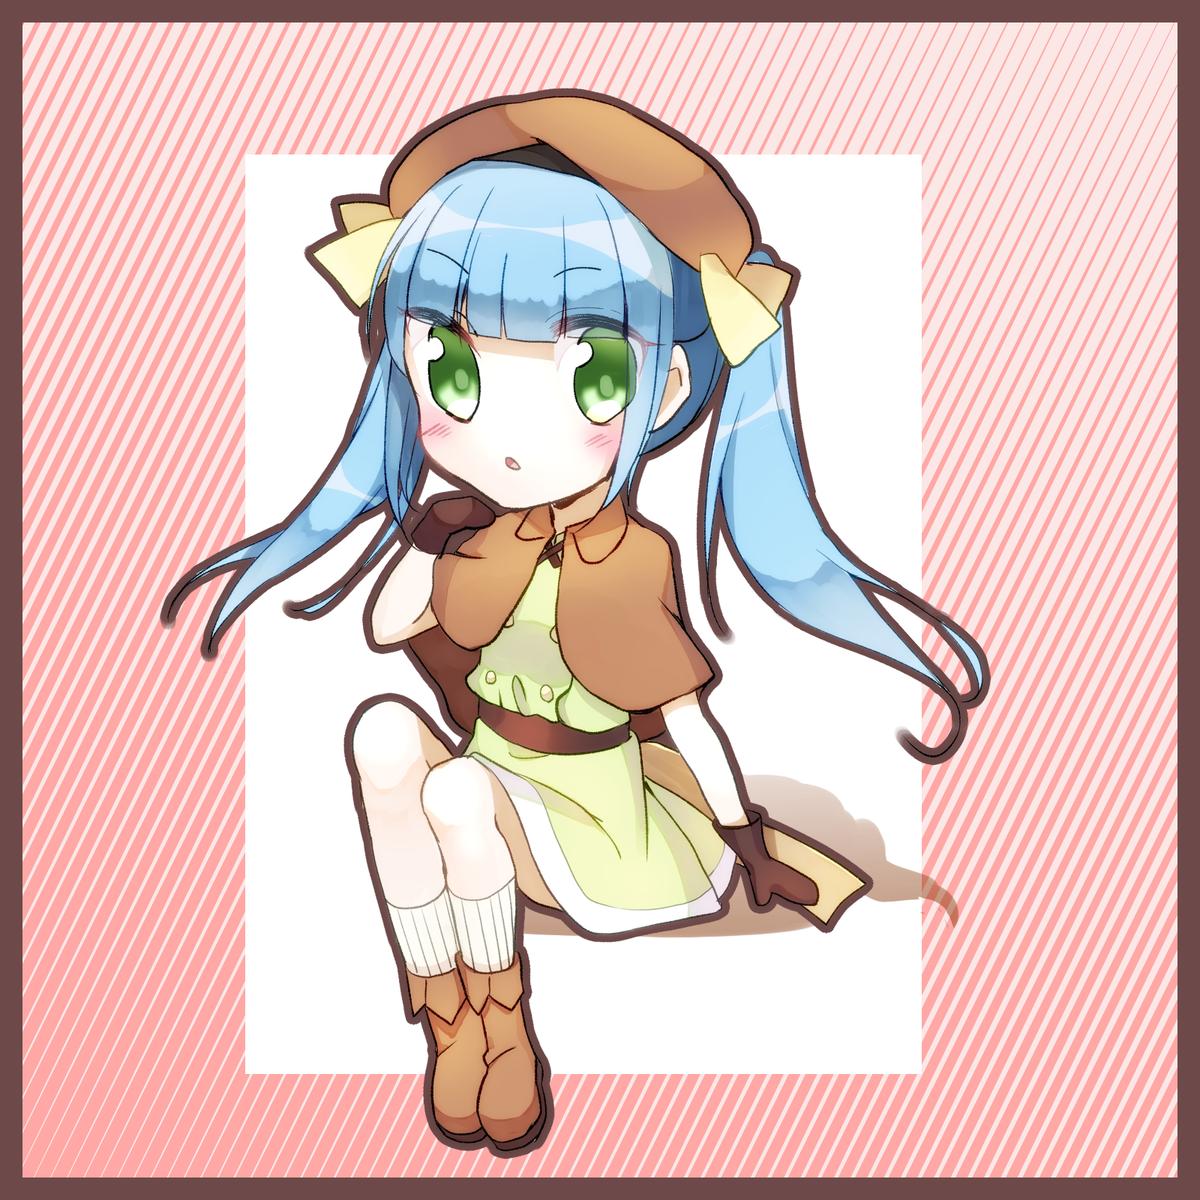 f:id:sakura-nagi1053:20200429141424p:plain